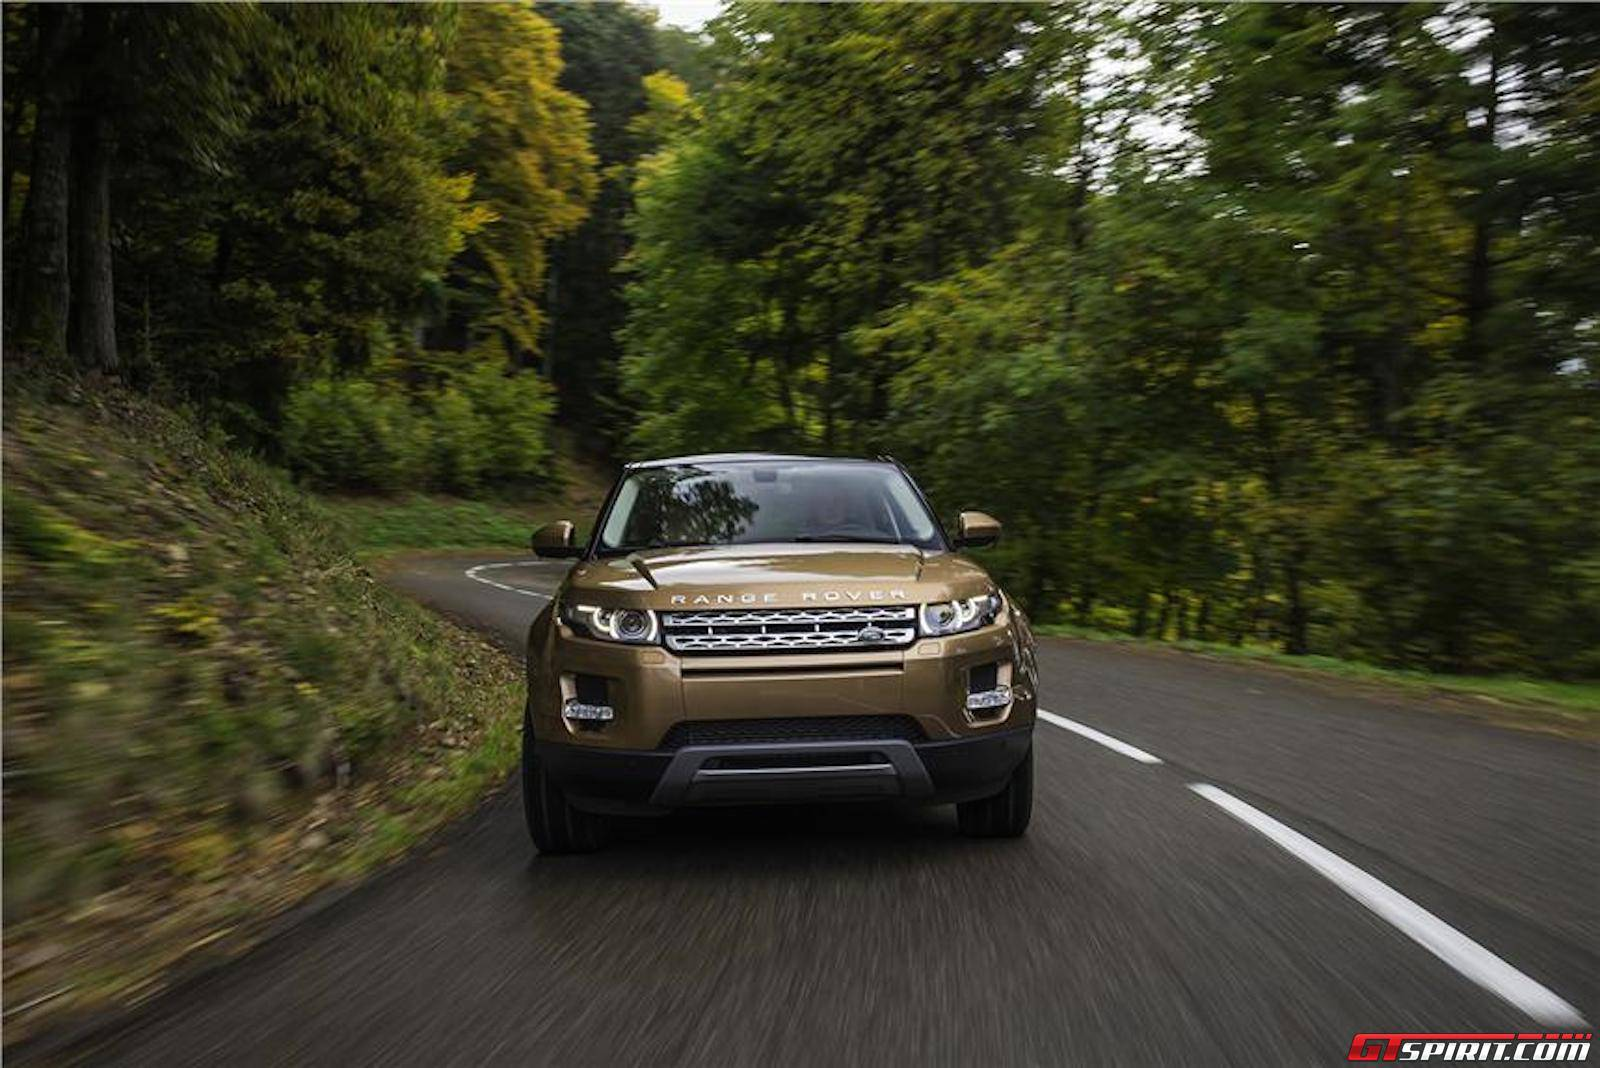 jaguar land rover to assemble range rover evoque in india gtspirit. Black Bedroom Furniture Sets. Home Design Ideas